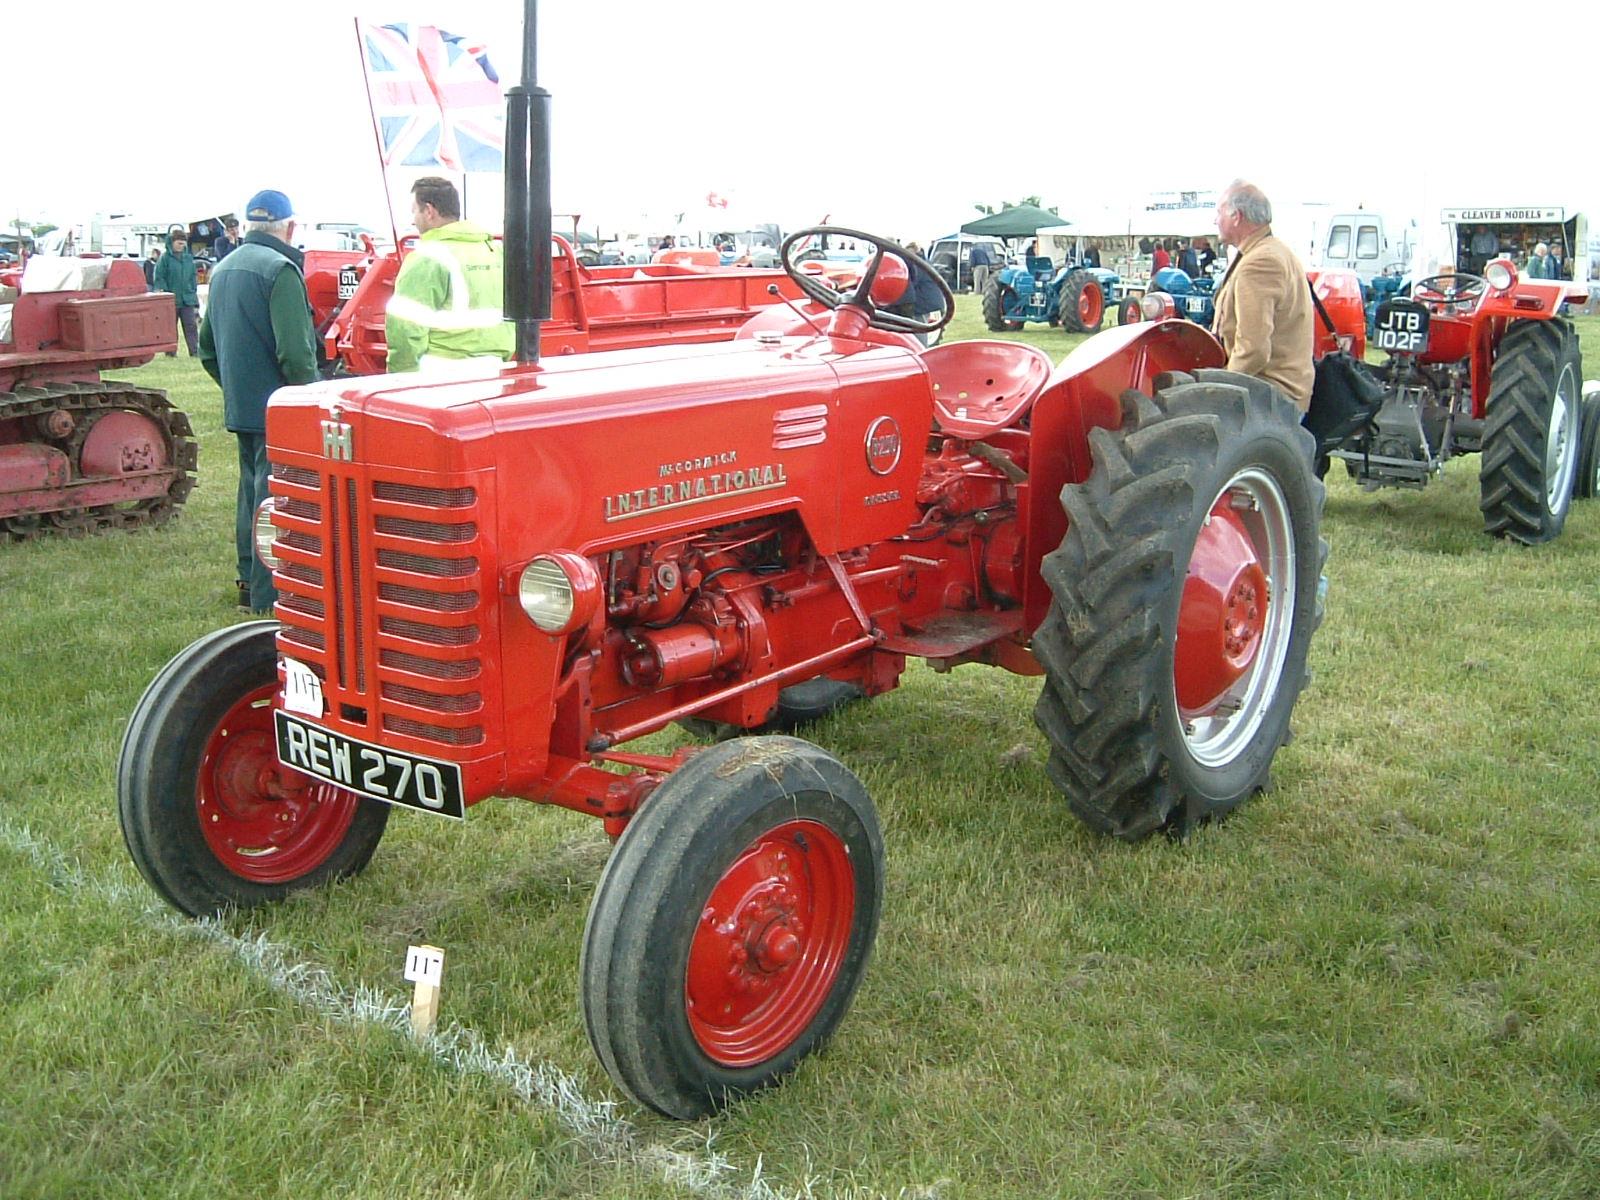 International B250 | Tractor & Construction Plant Wiki | FANDOM